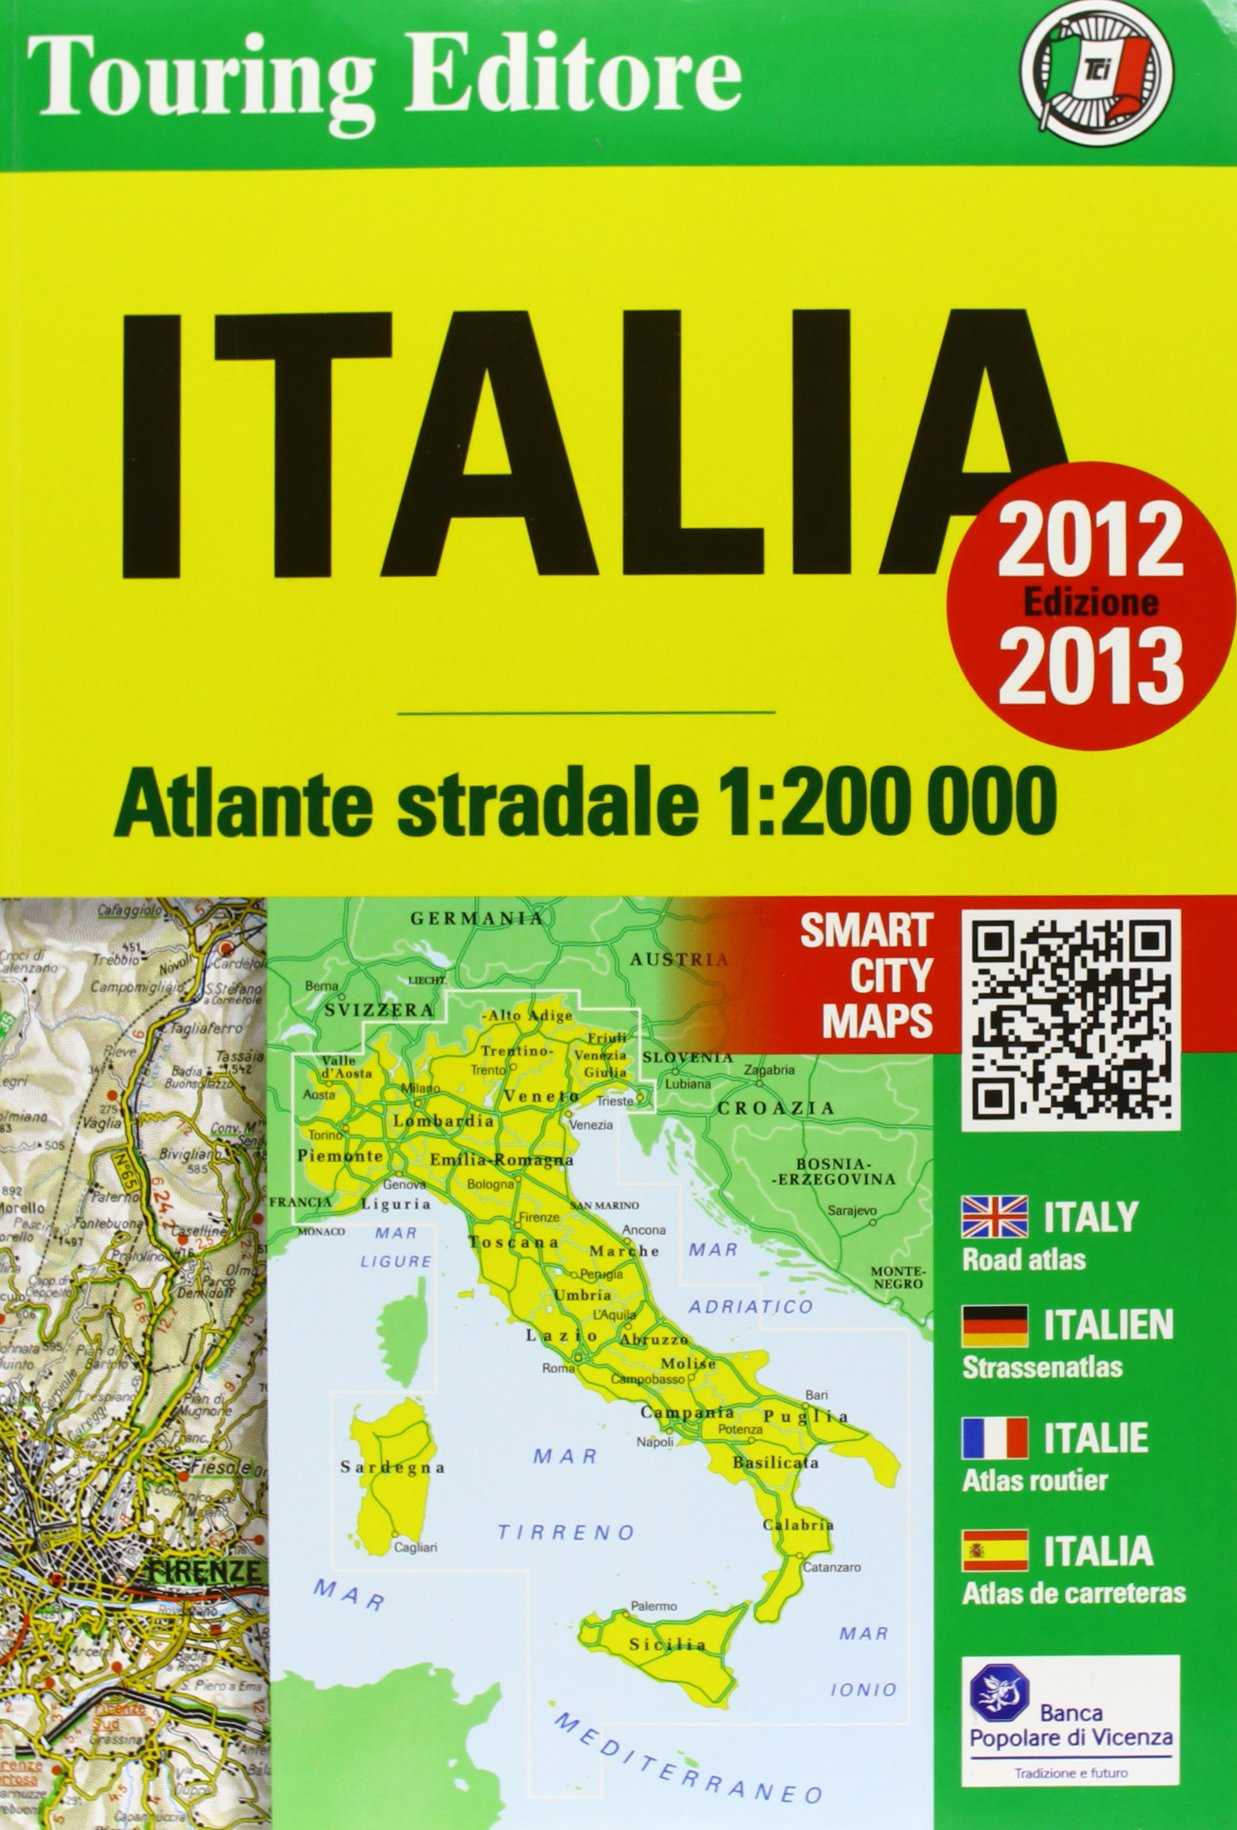 Atlante stradale Italia 1:200.000 2012-2013